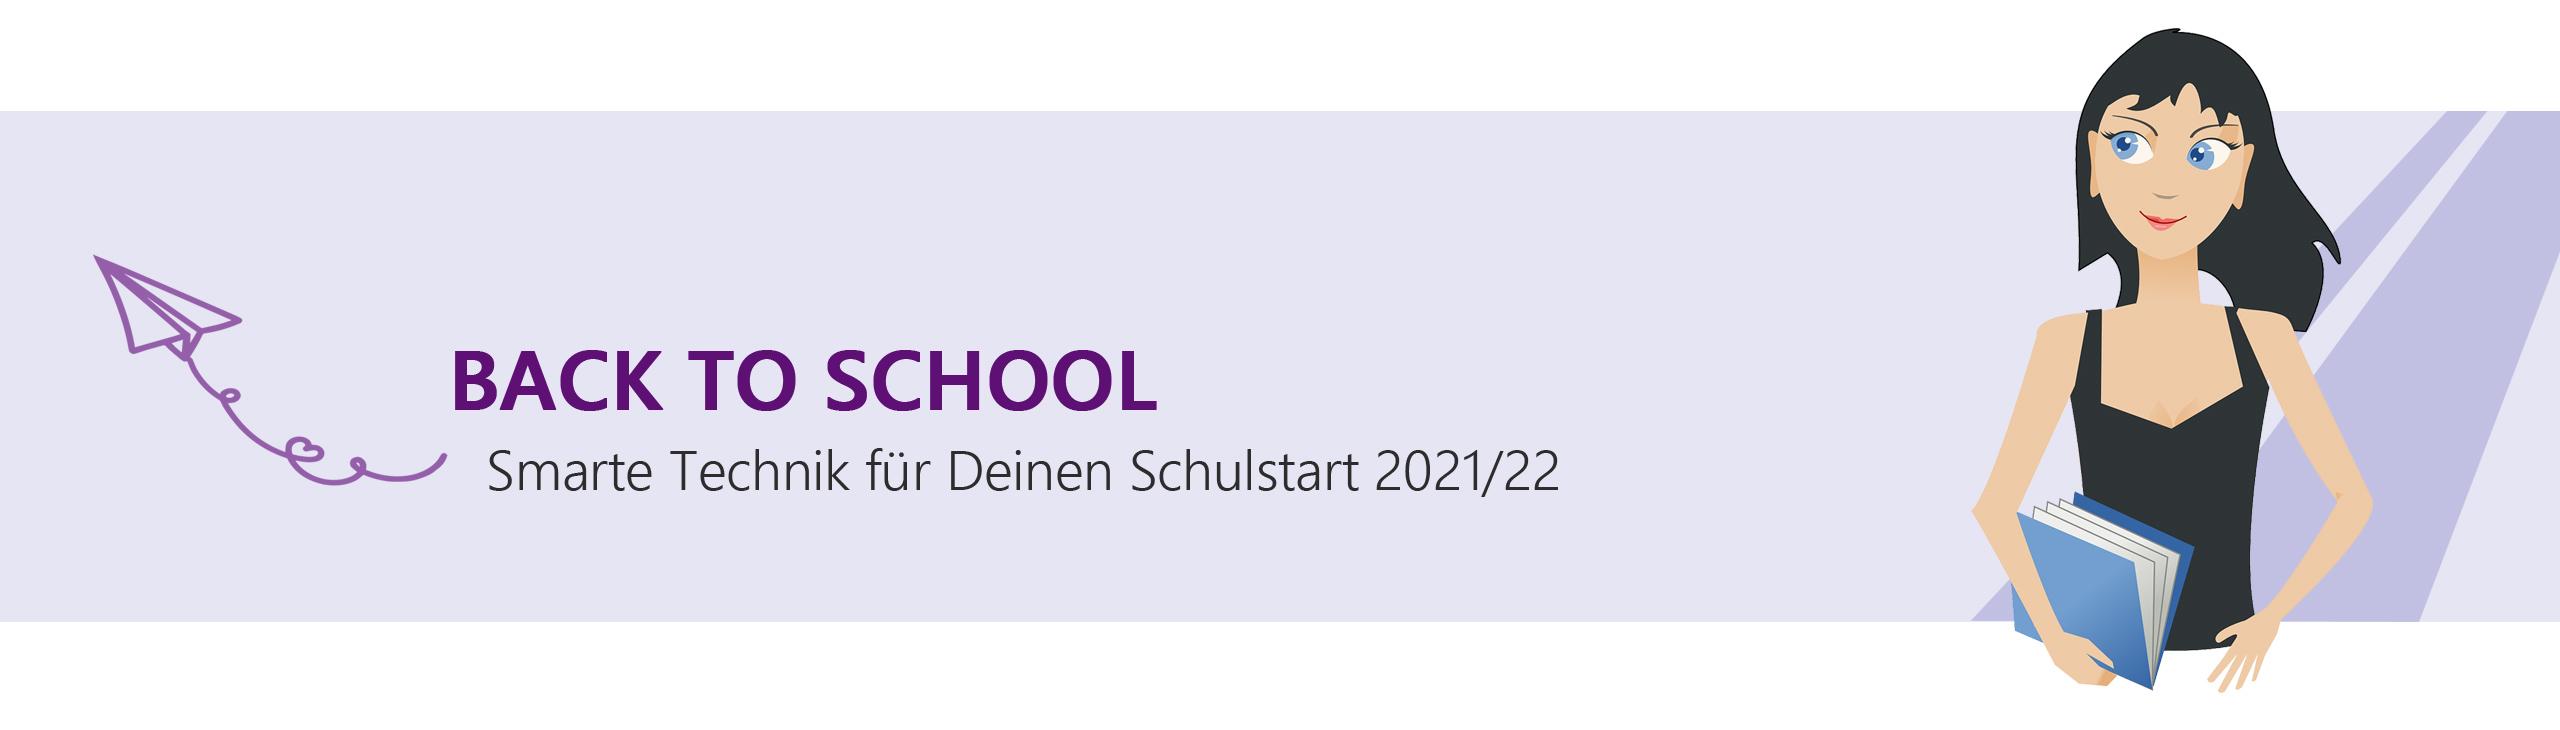 Banner BacktoSchool 2021